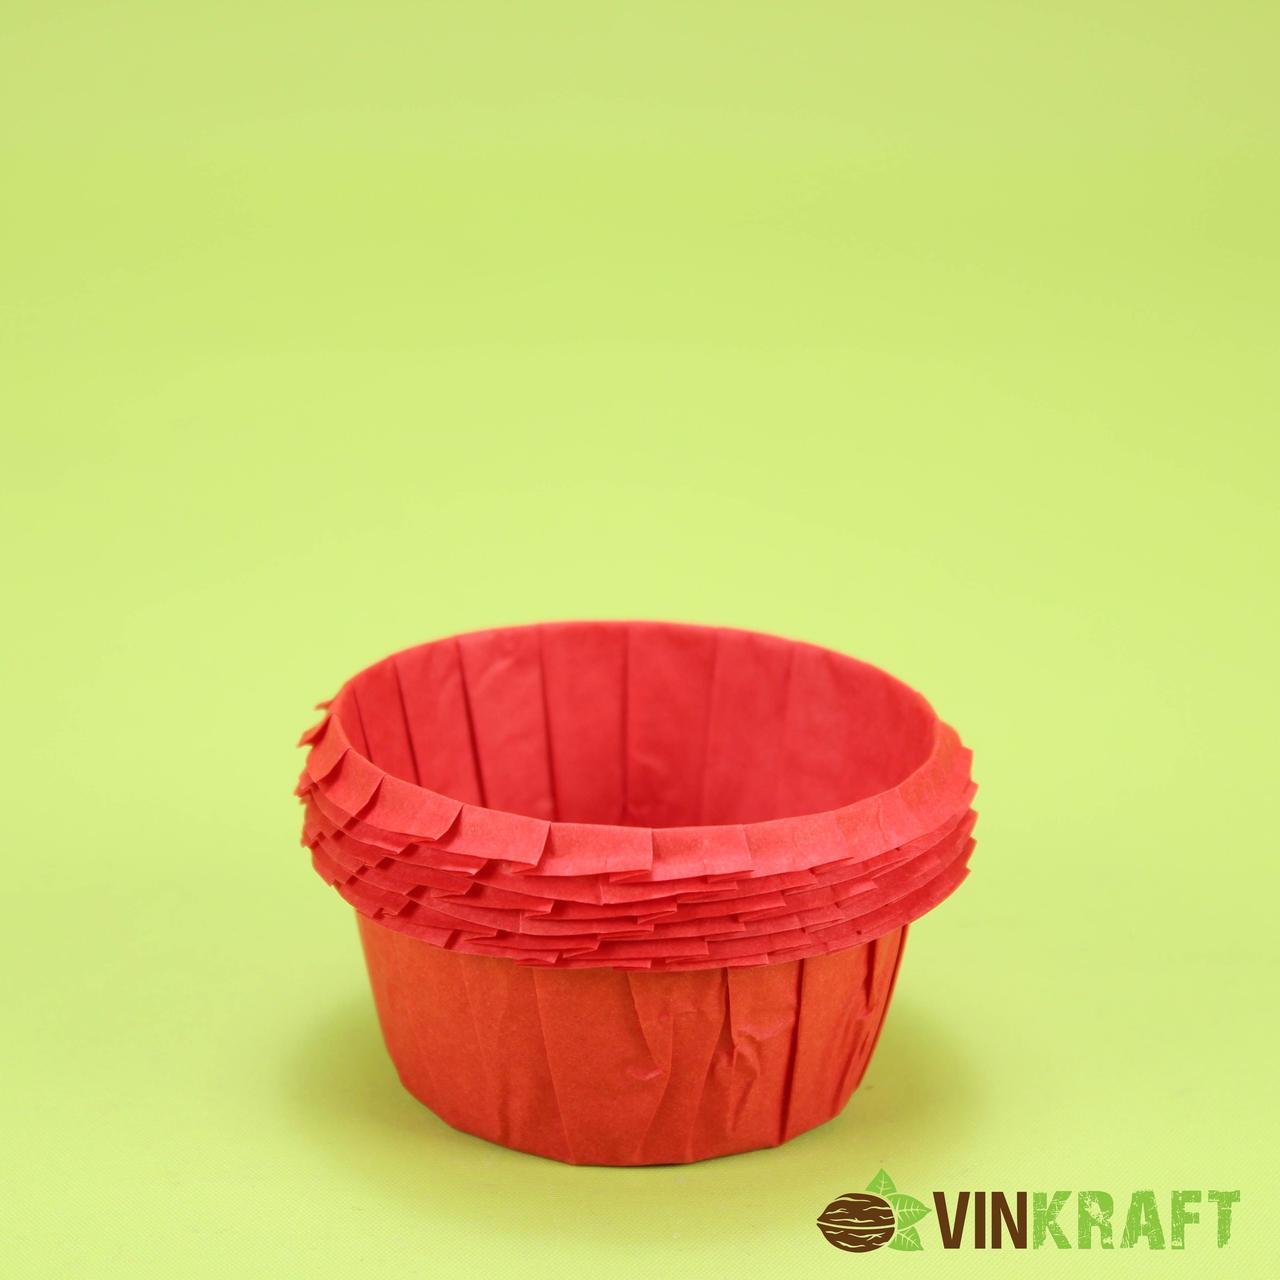 Паперова форма (55*35)  з посиленним бортиком для кексів, червона